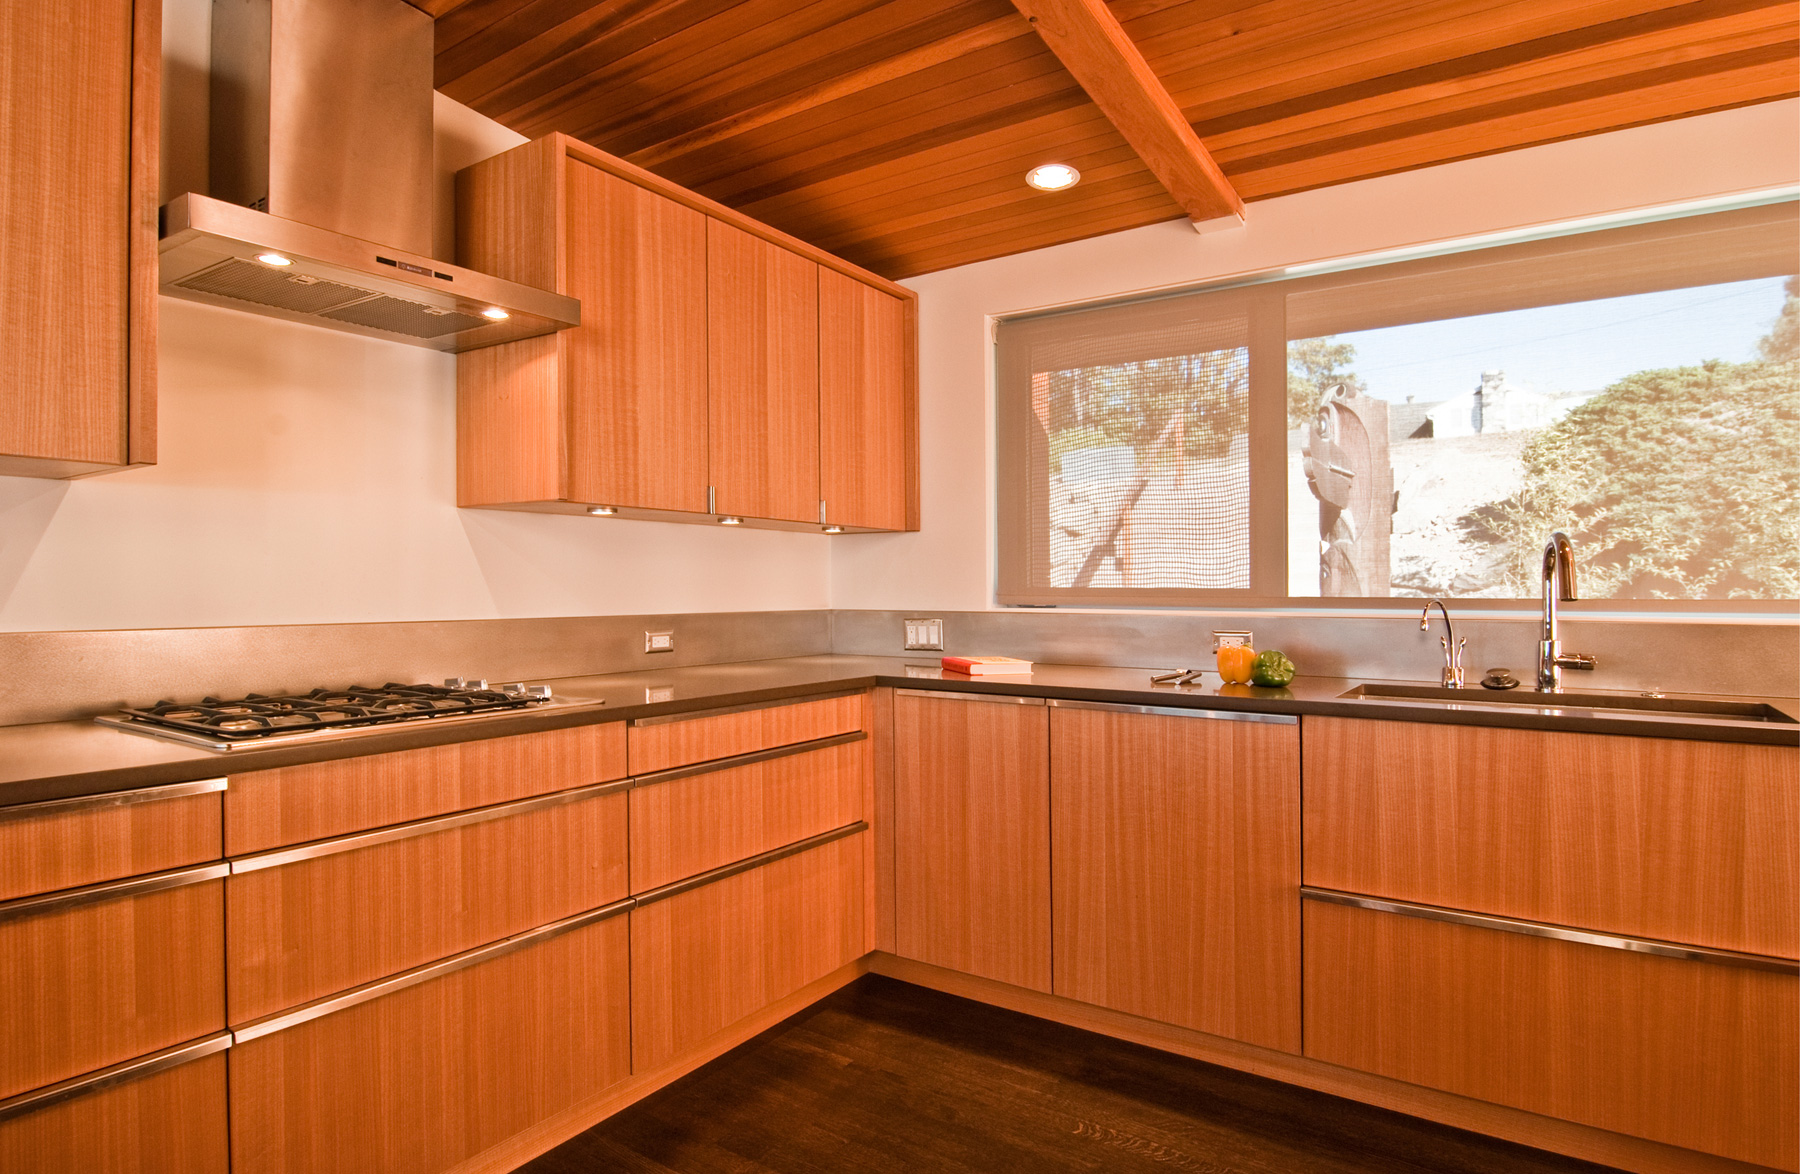 Mid Century Modern Kitchen Cabinets Recommendation